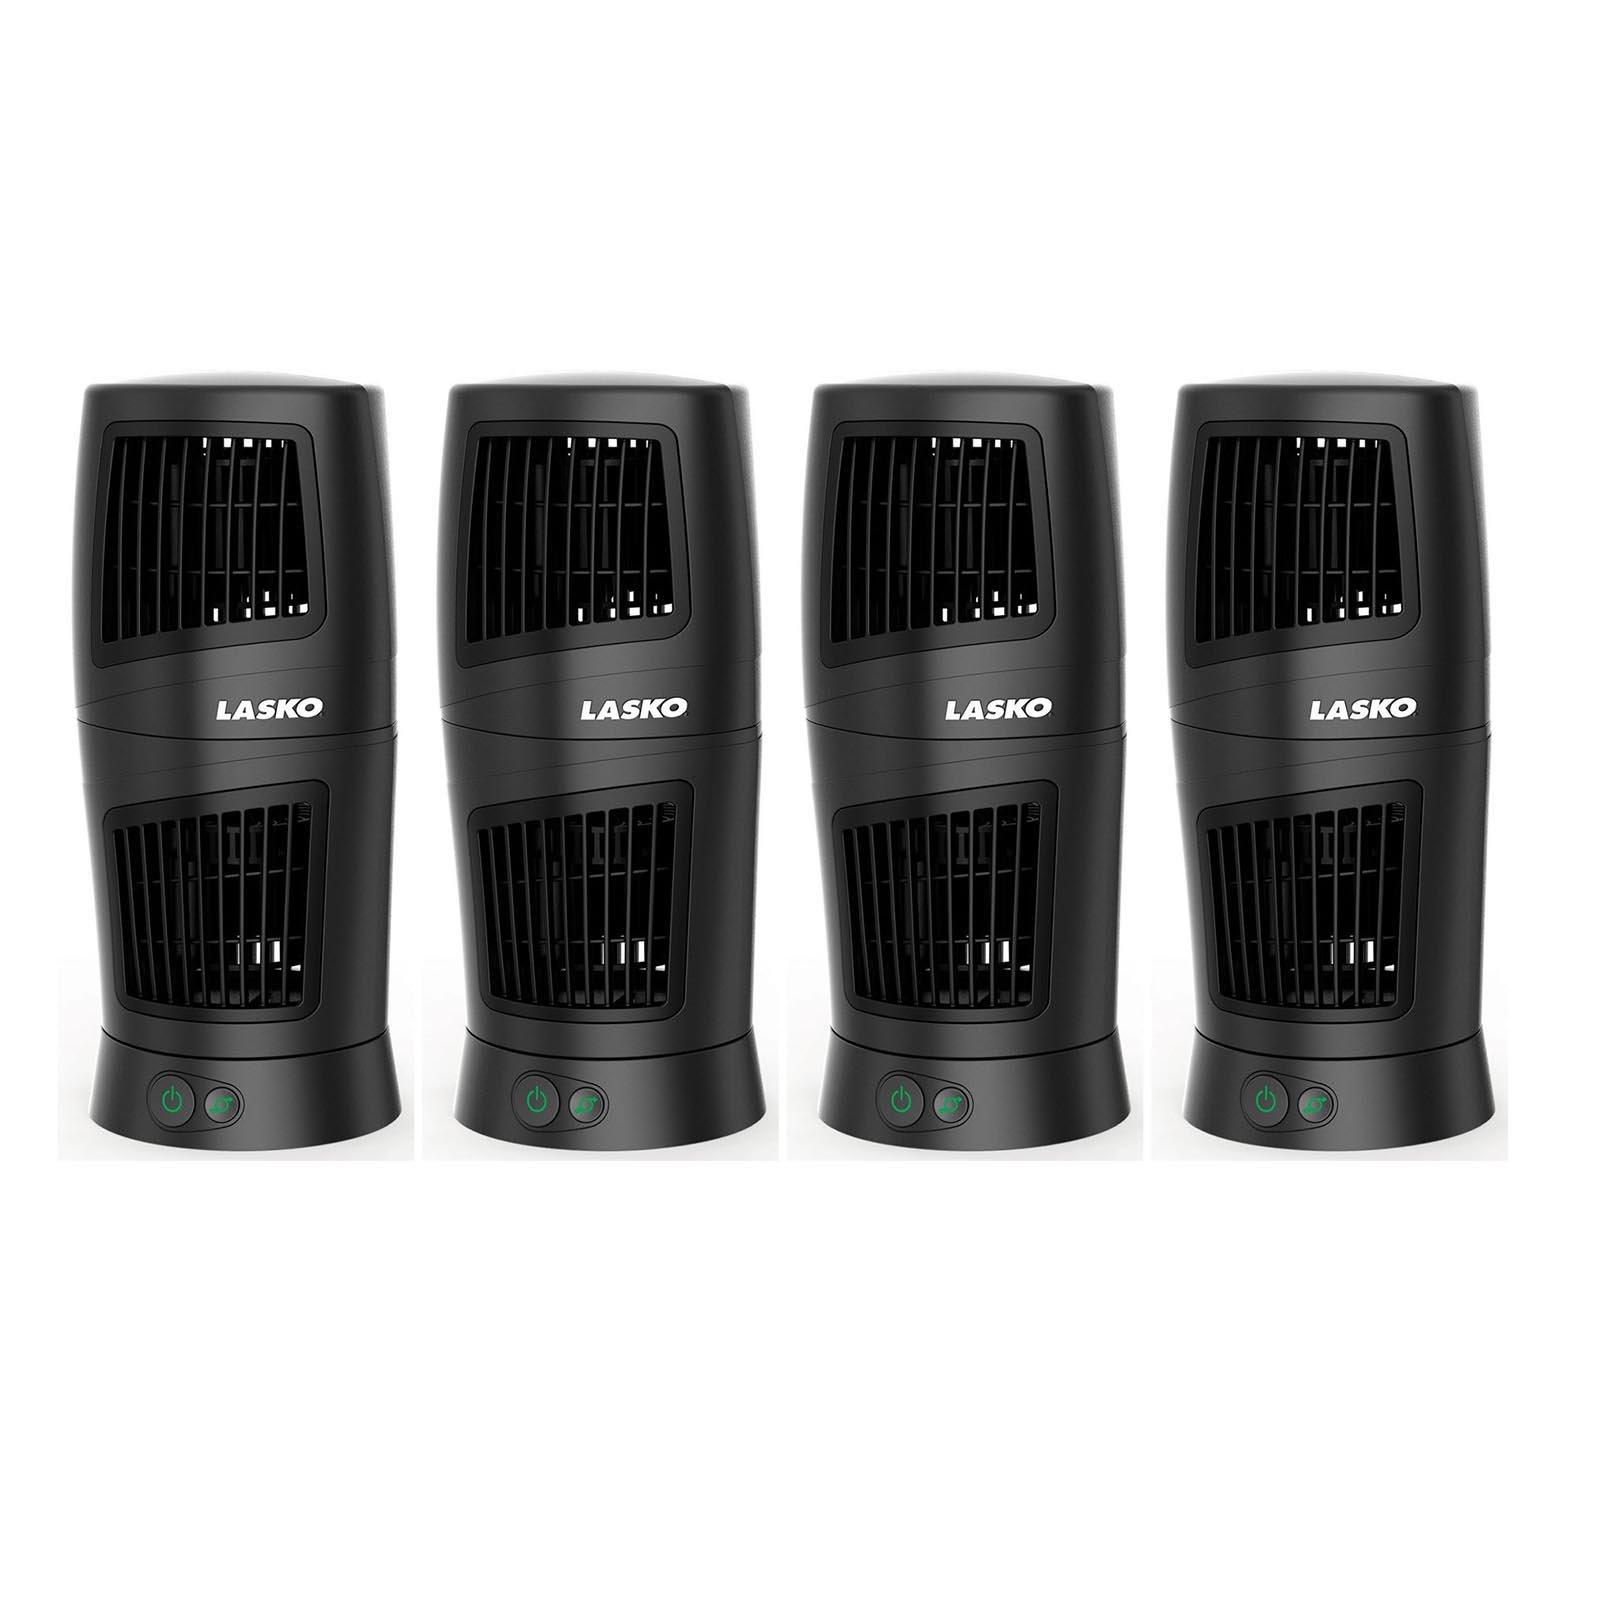 "Lasko Twist Top Slim Compact 12"" Portable Oscillating Desk Tower Fan (4 Pack)"